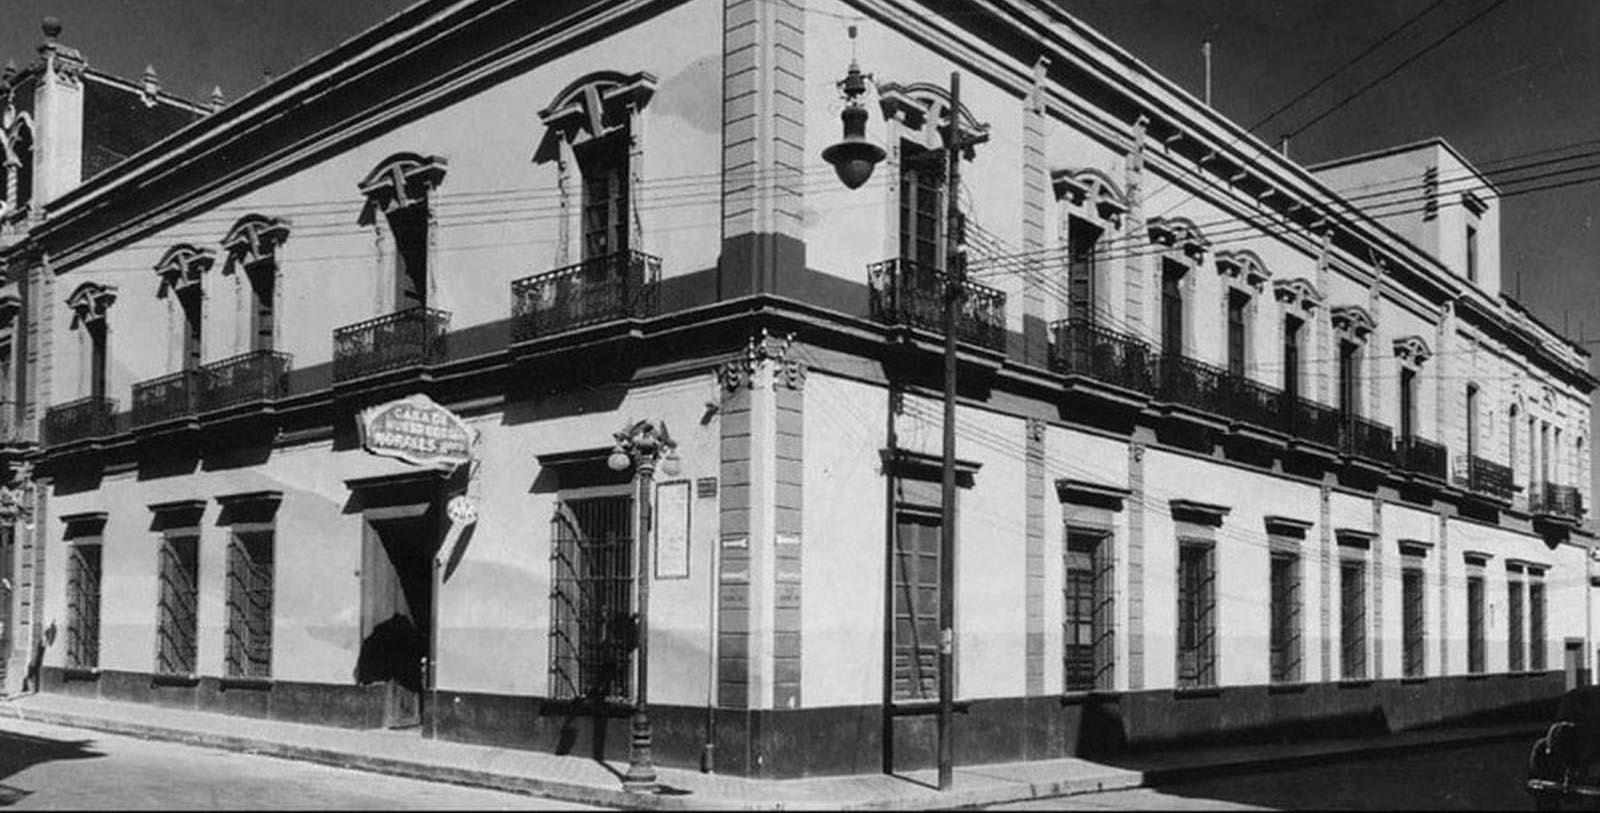 Historic Exterior of Hotel Morales in Guadalajara, Jalisco, Mexico